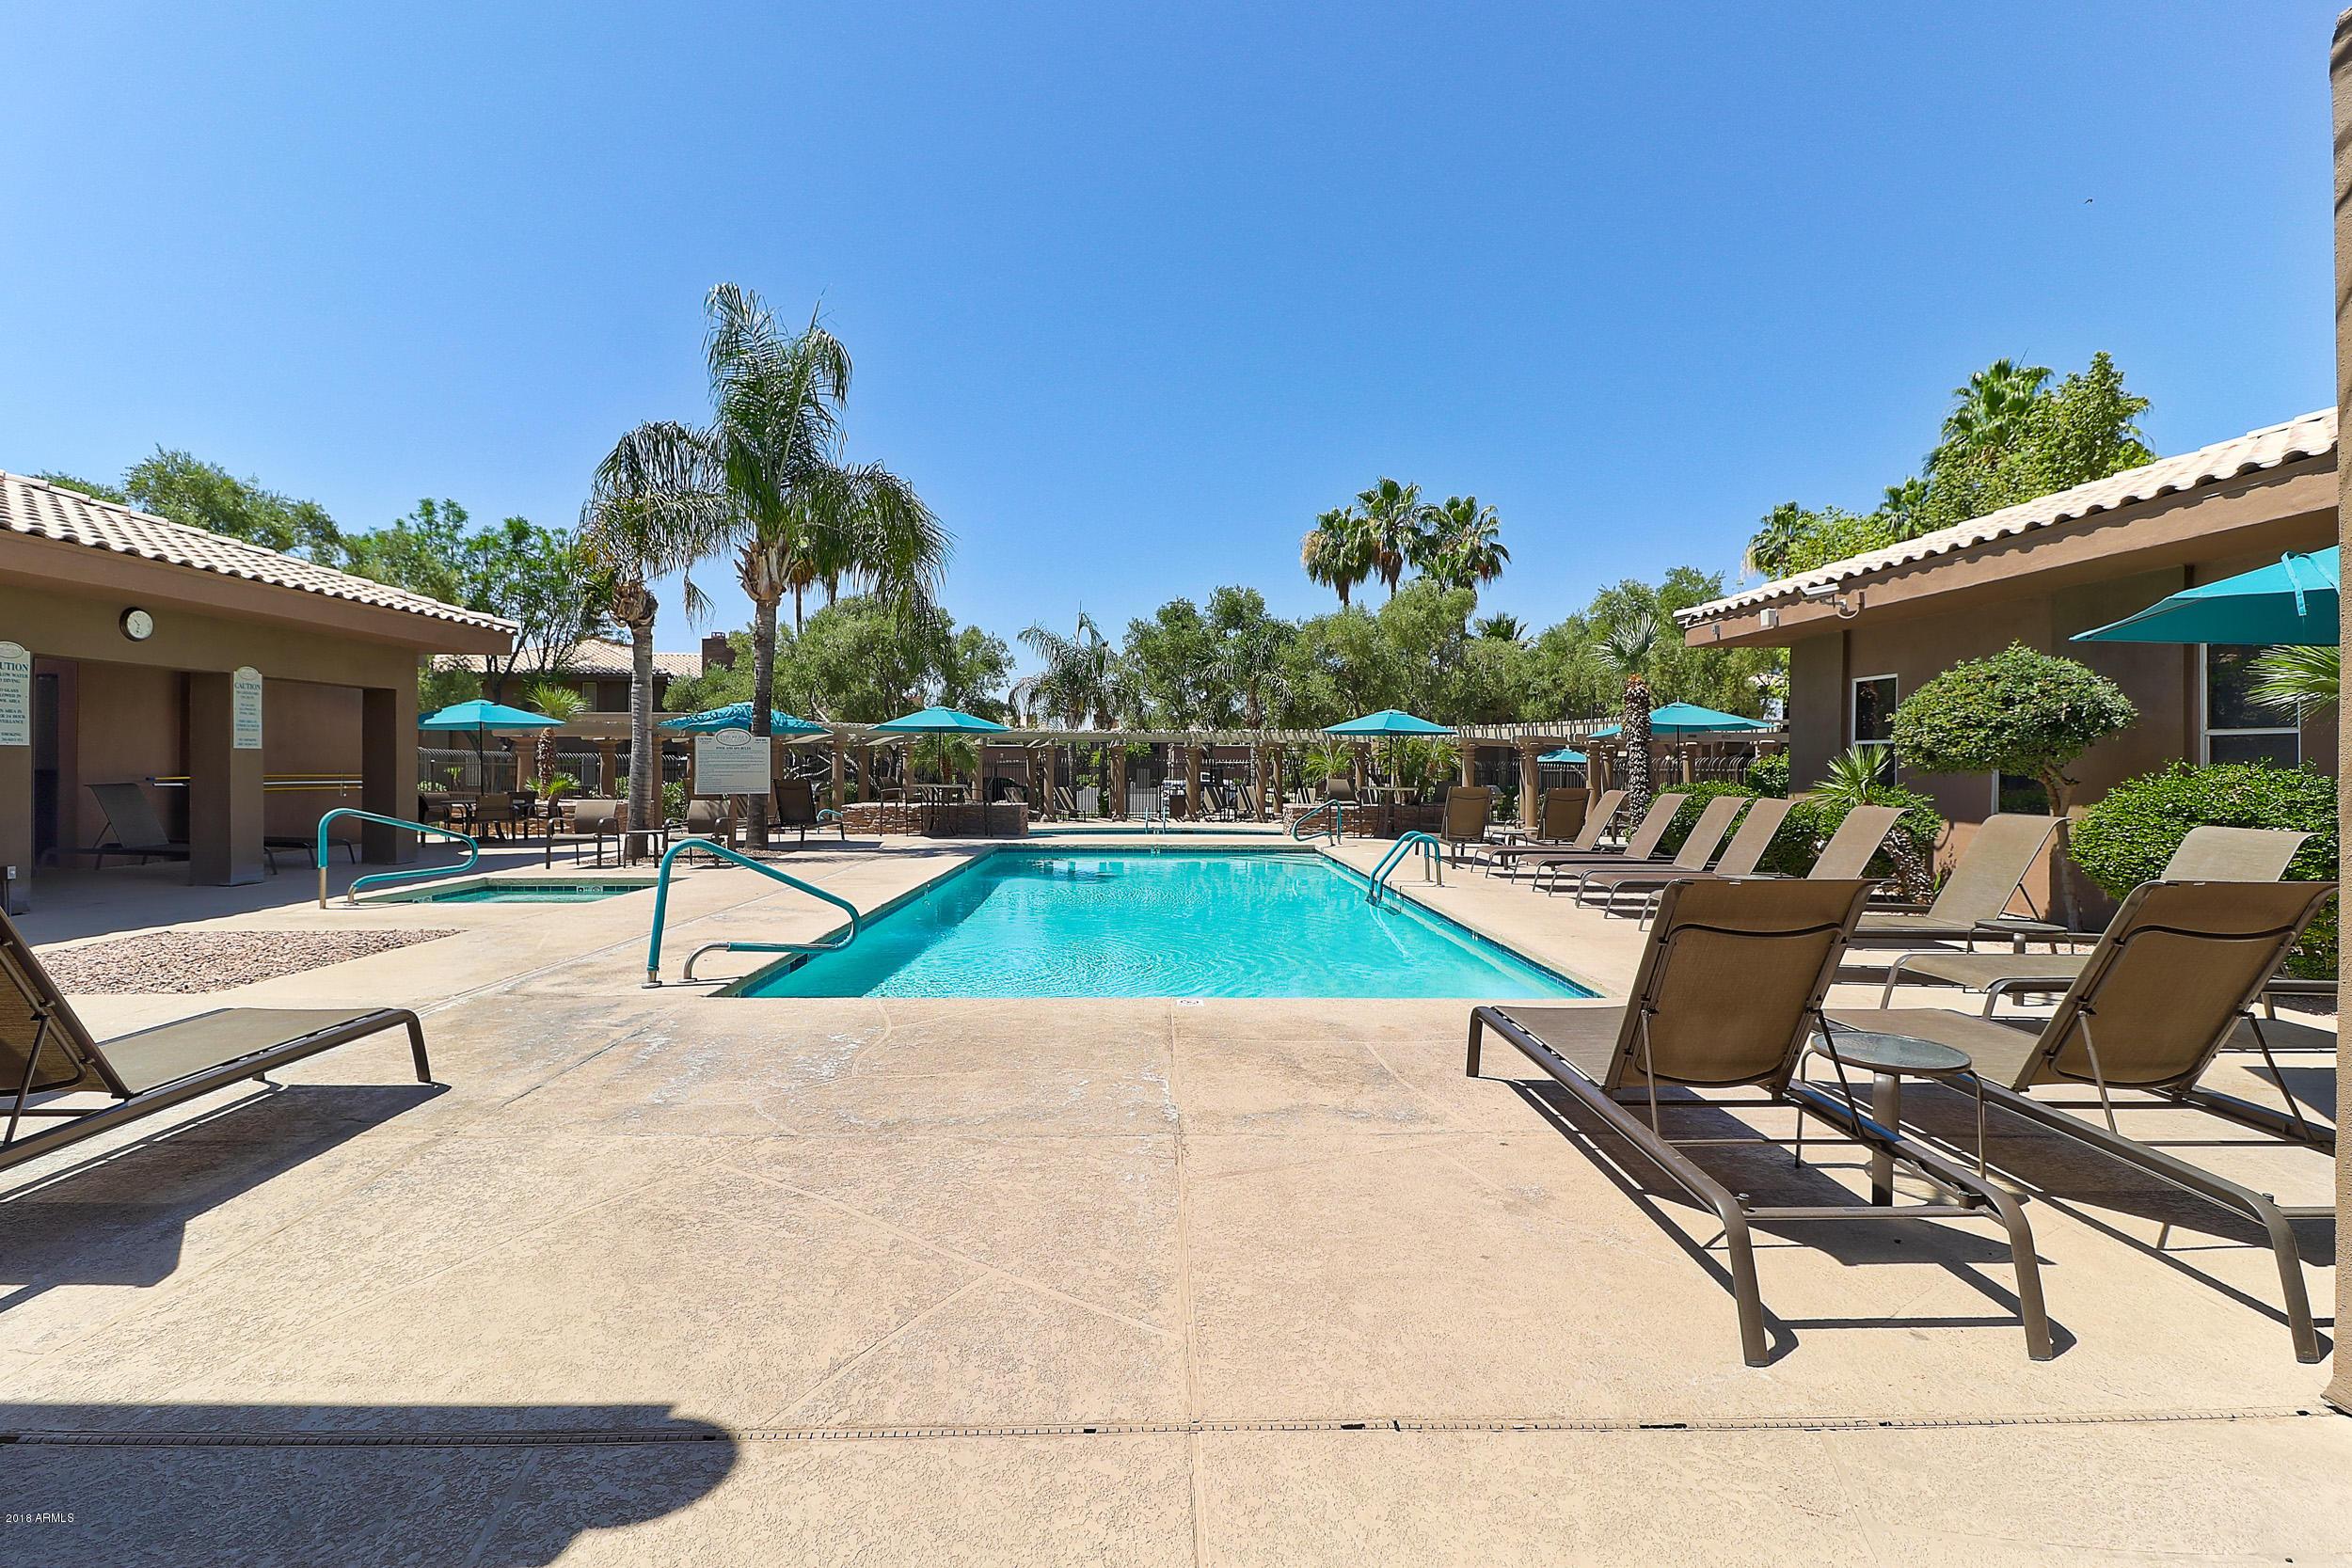 7009 E ACOMA Drive # 1018, Scottsdale, Arizona 85254, 1 Bedroom Bedrooms, ,Residential Lease,For Rent,7009 E ACOMA Drive # 1018,5844654